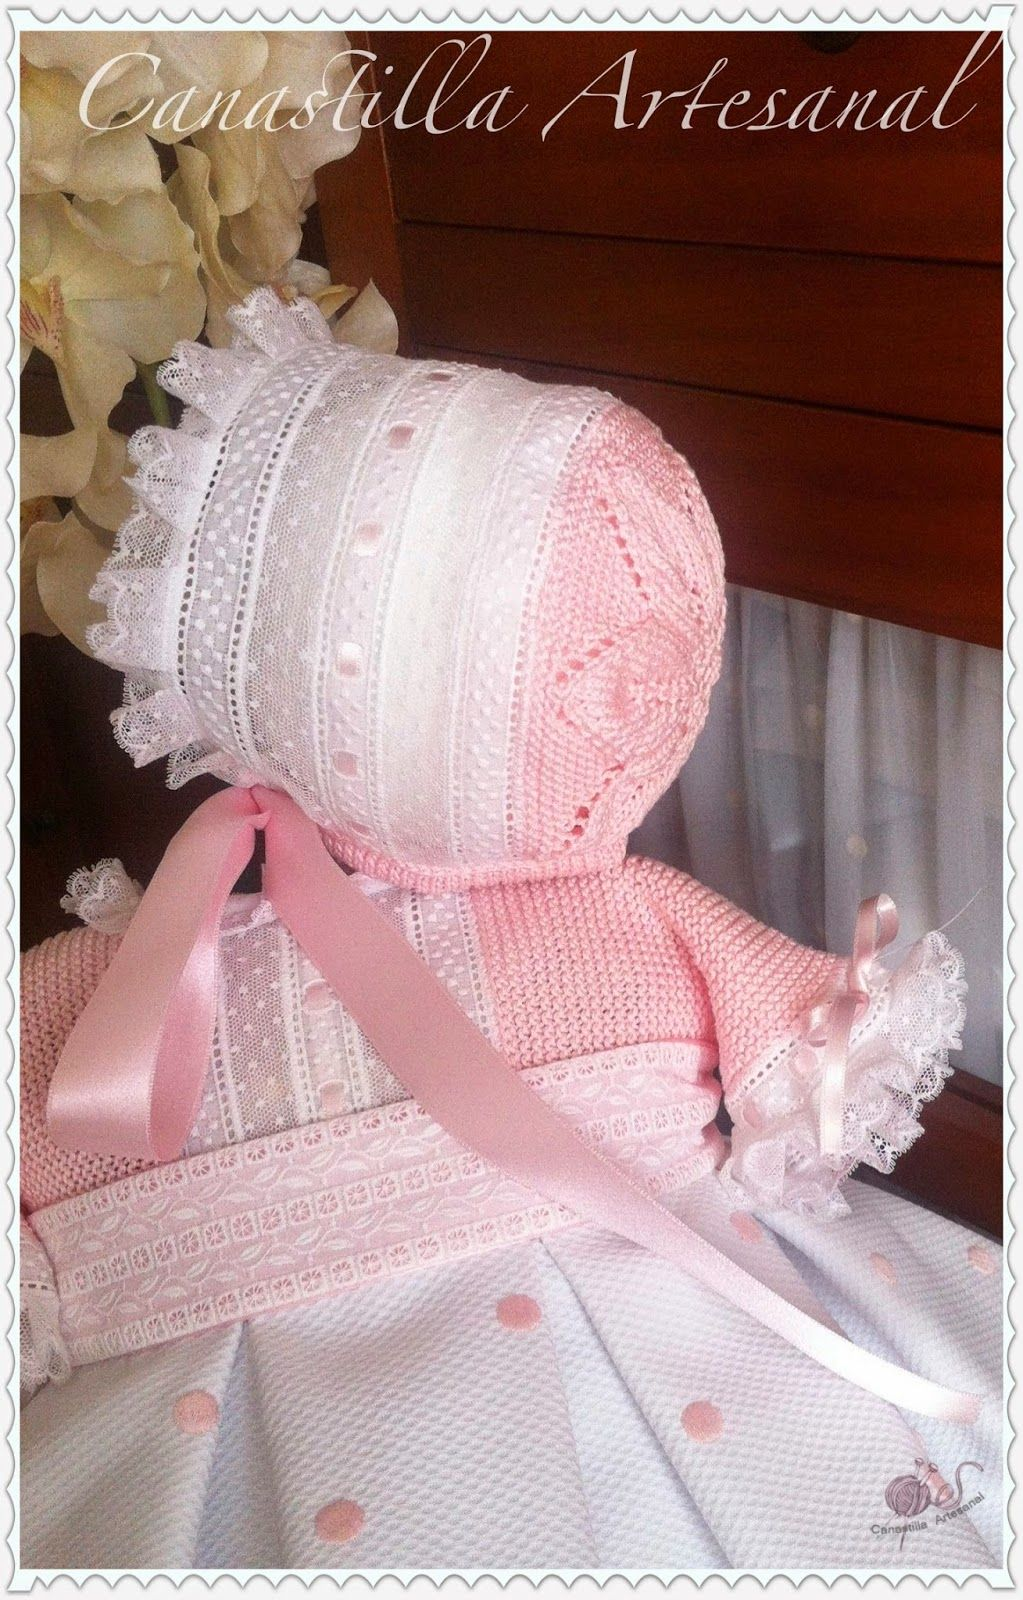 Canastilla artesanal capotas moda pinterest - Canastilla artesanal bebe ...